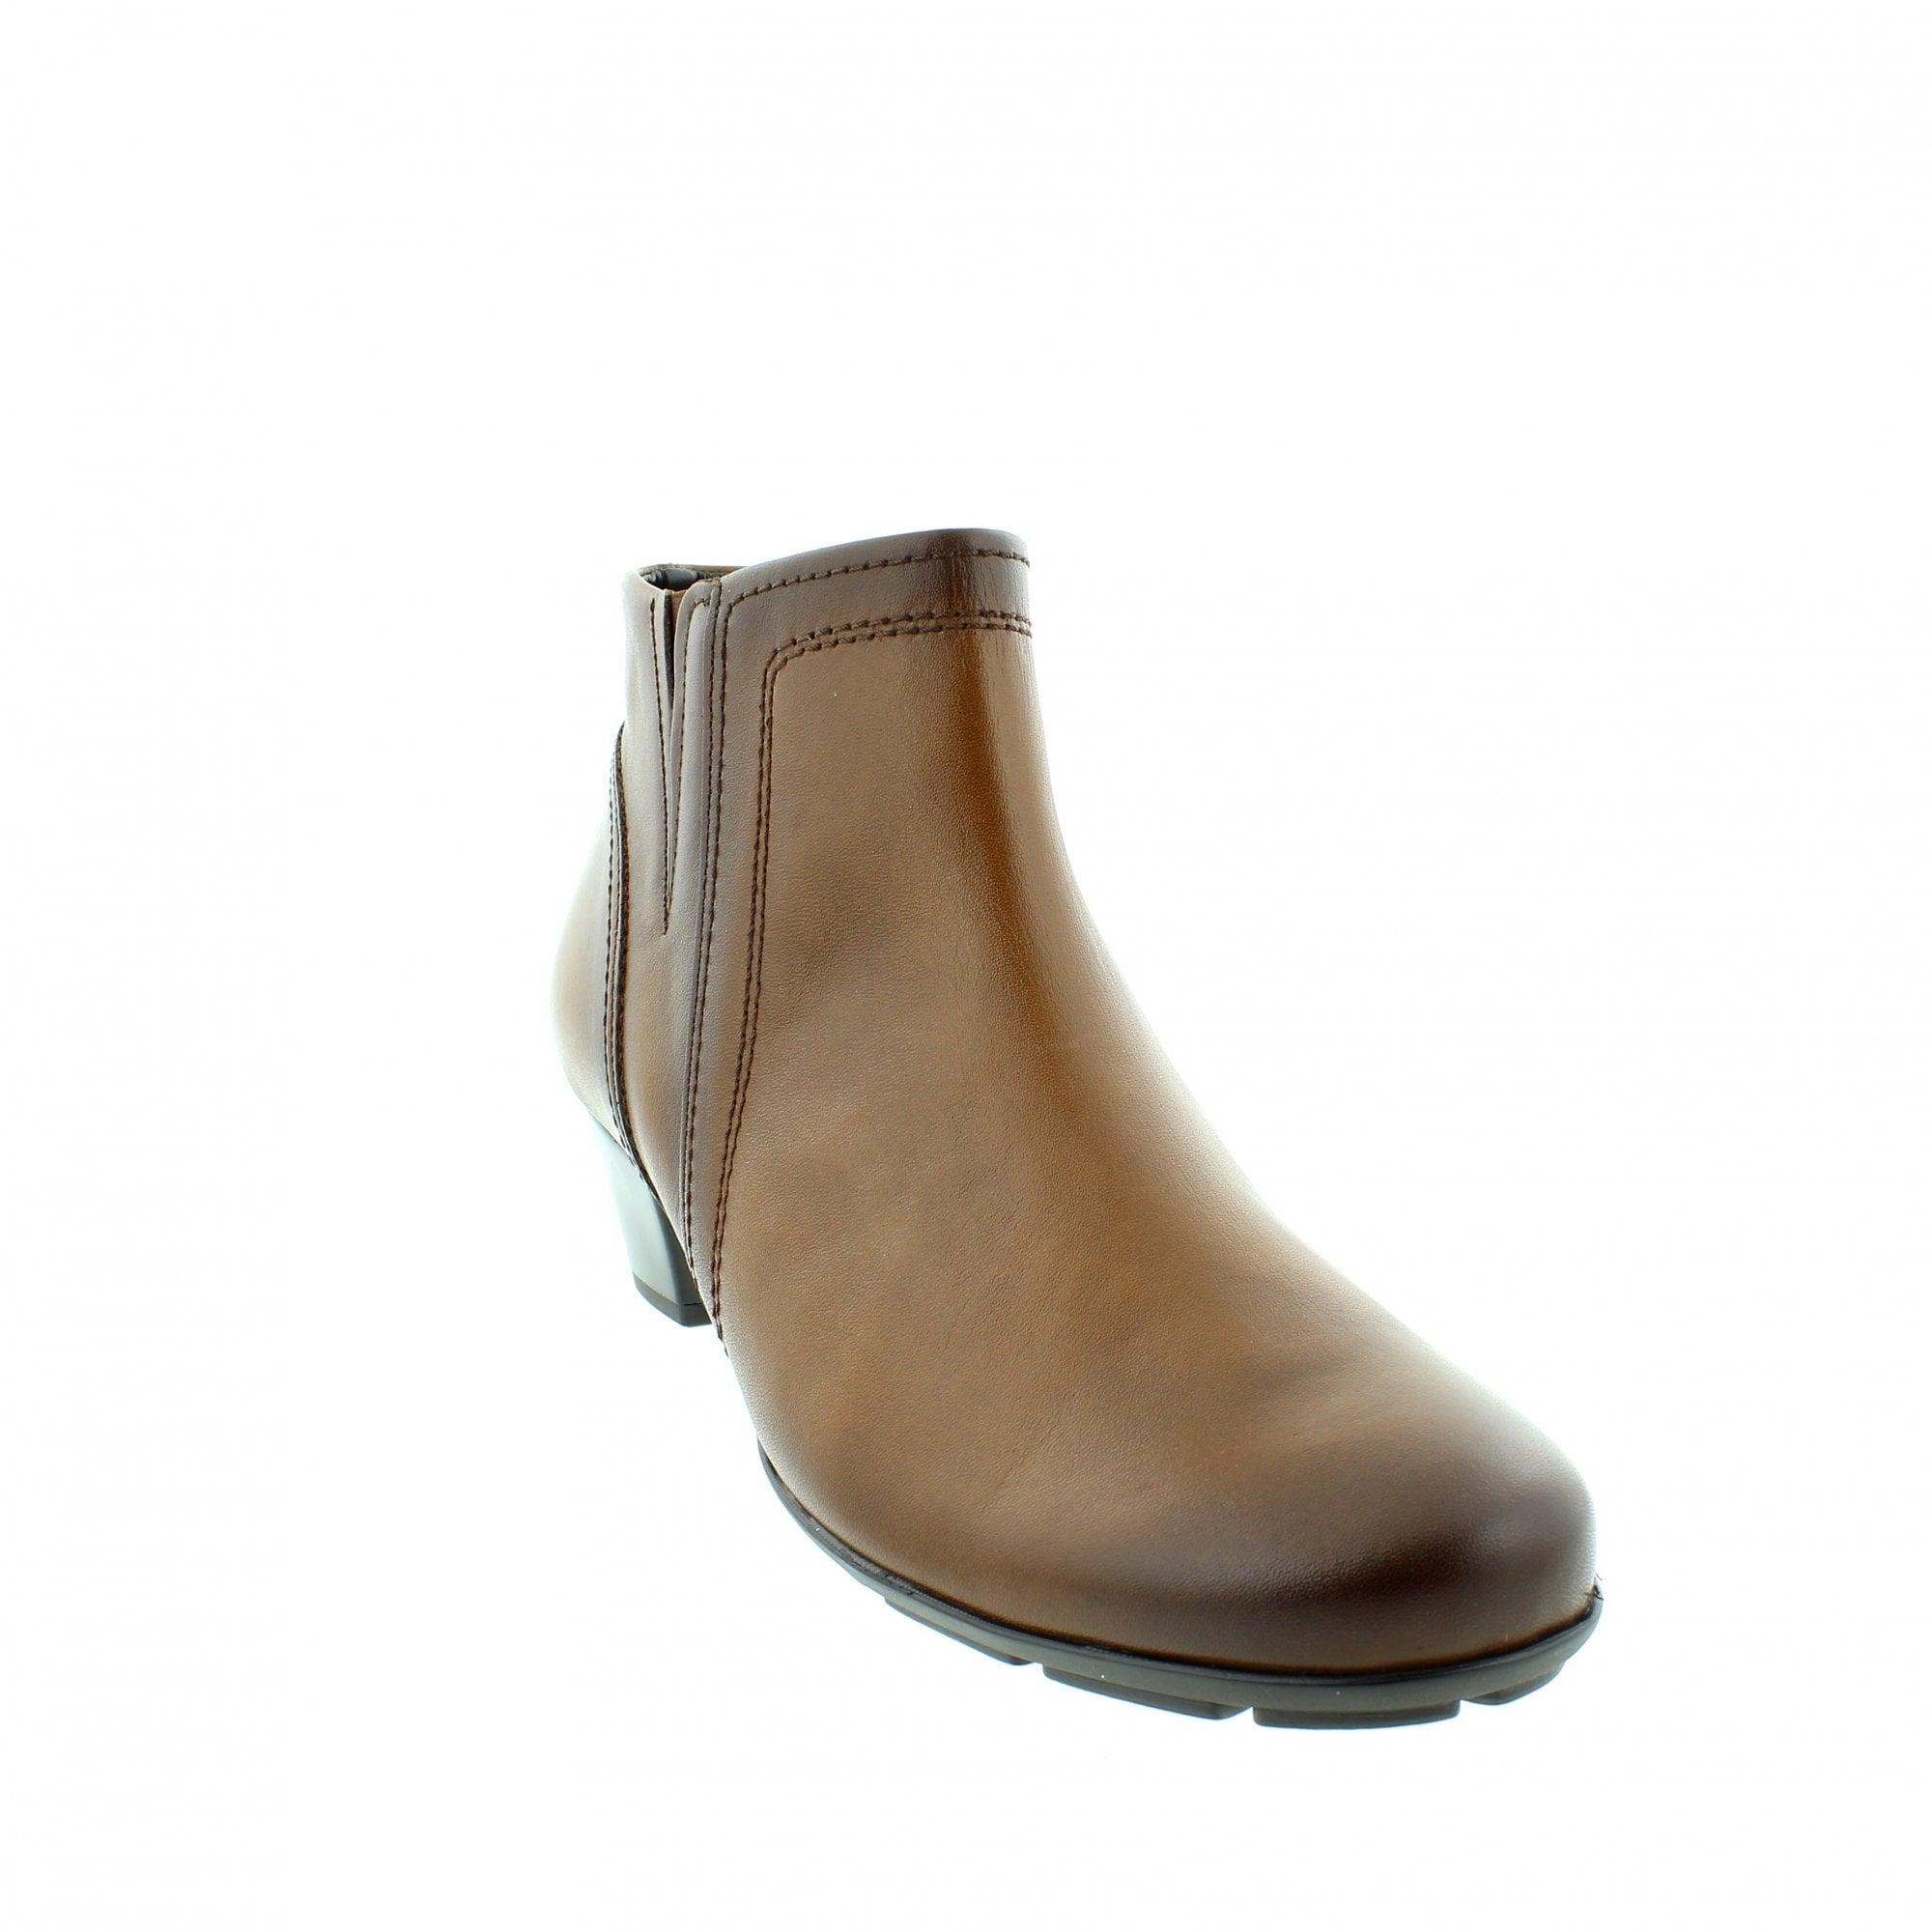 Gabor Heritage 95-638-22 Tan Leather